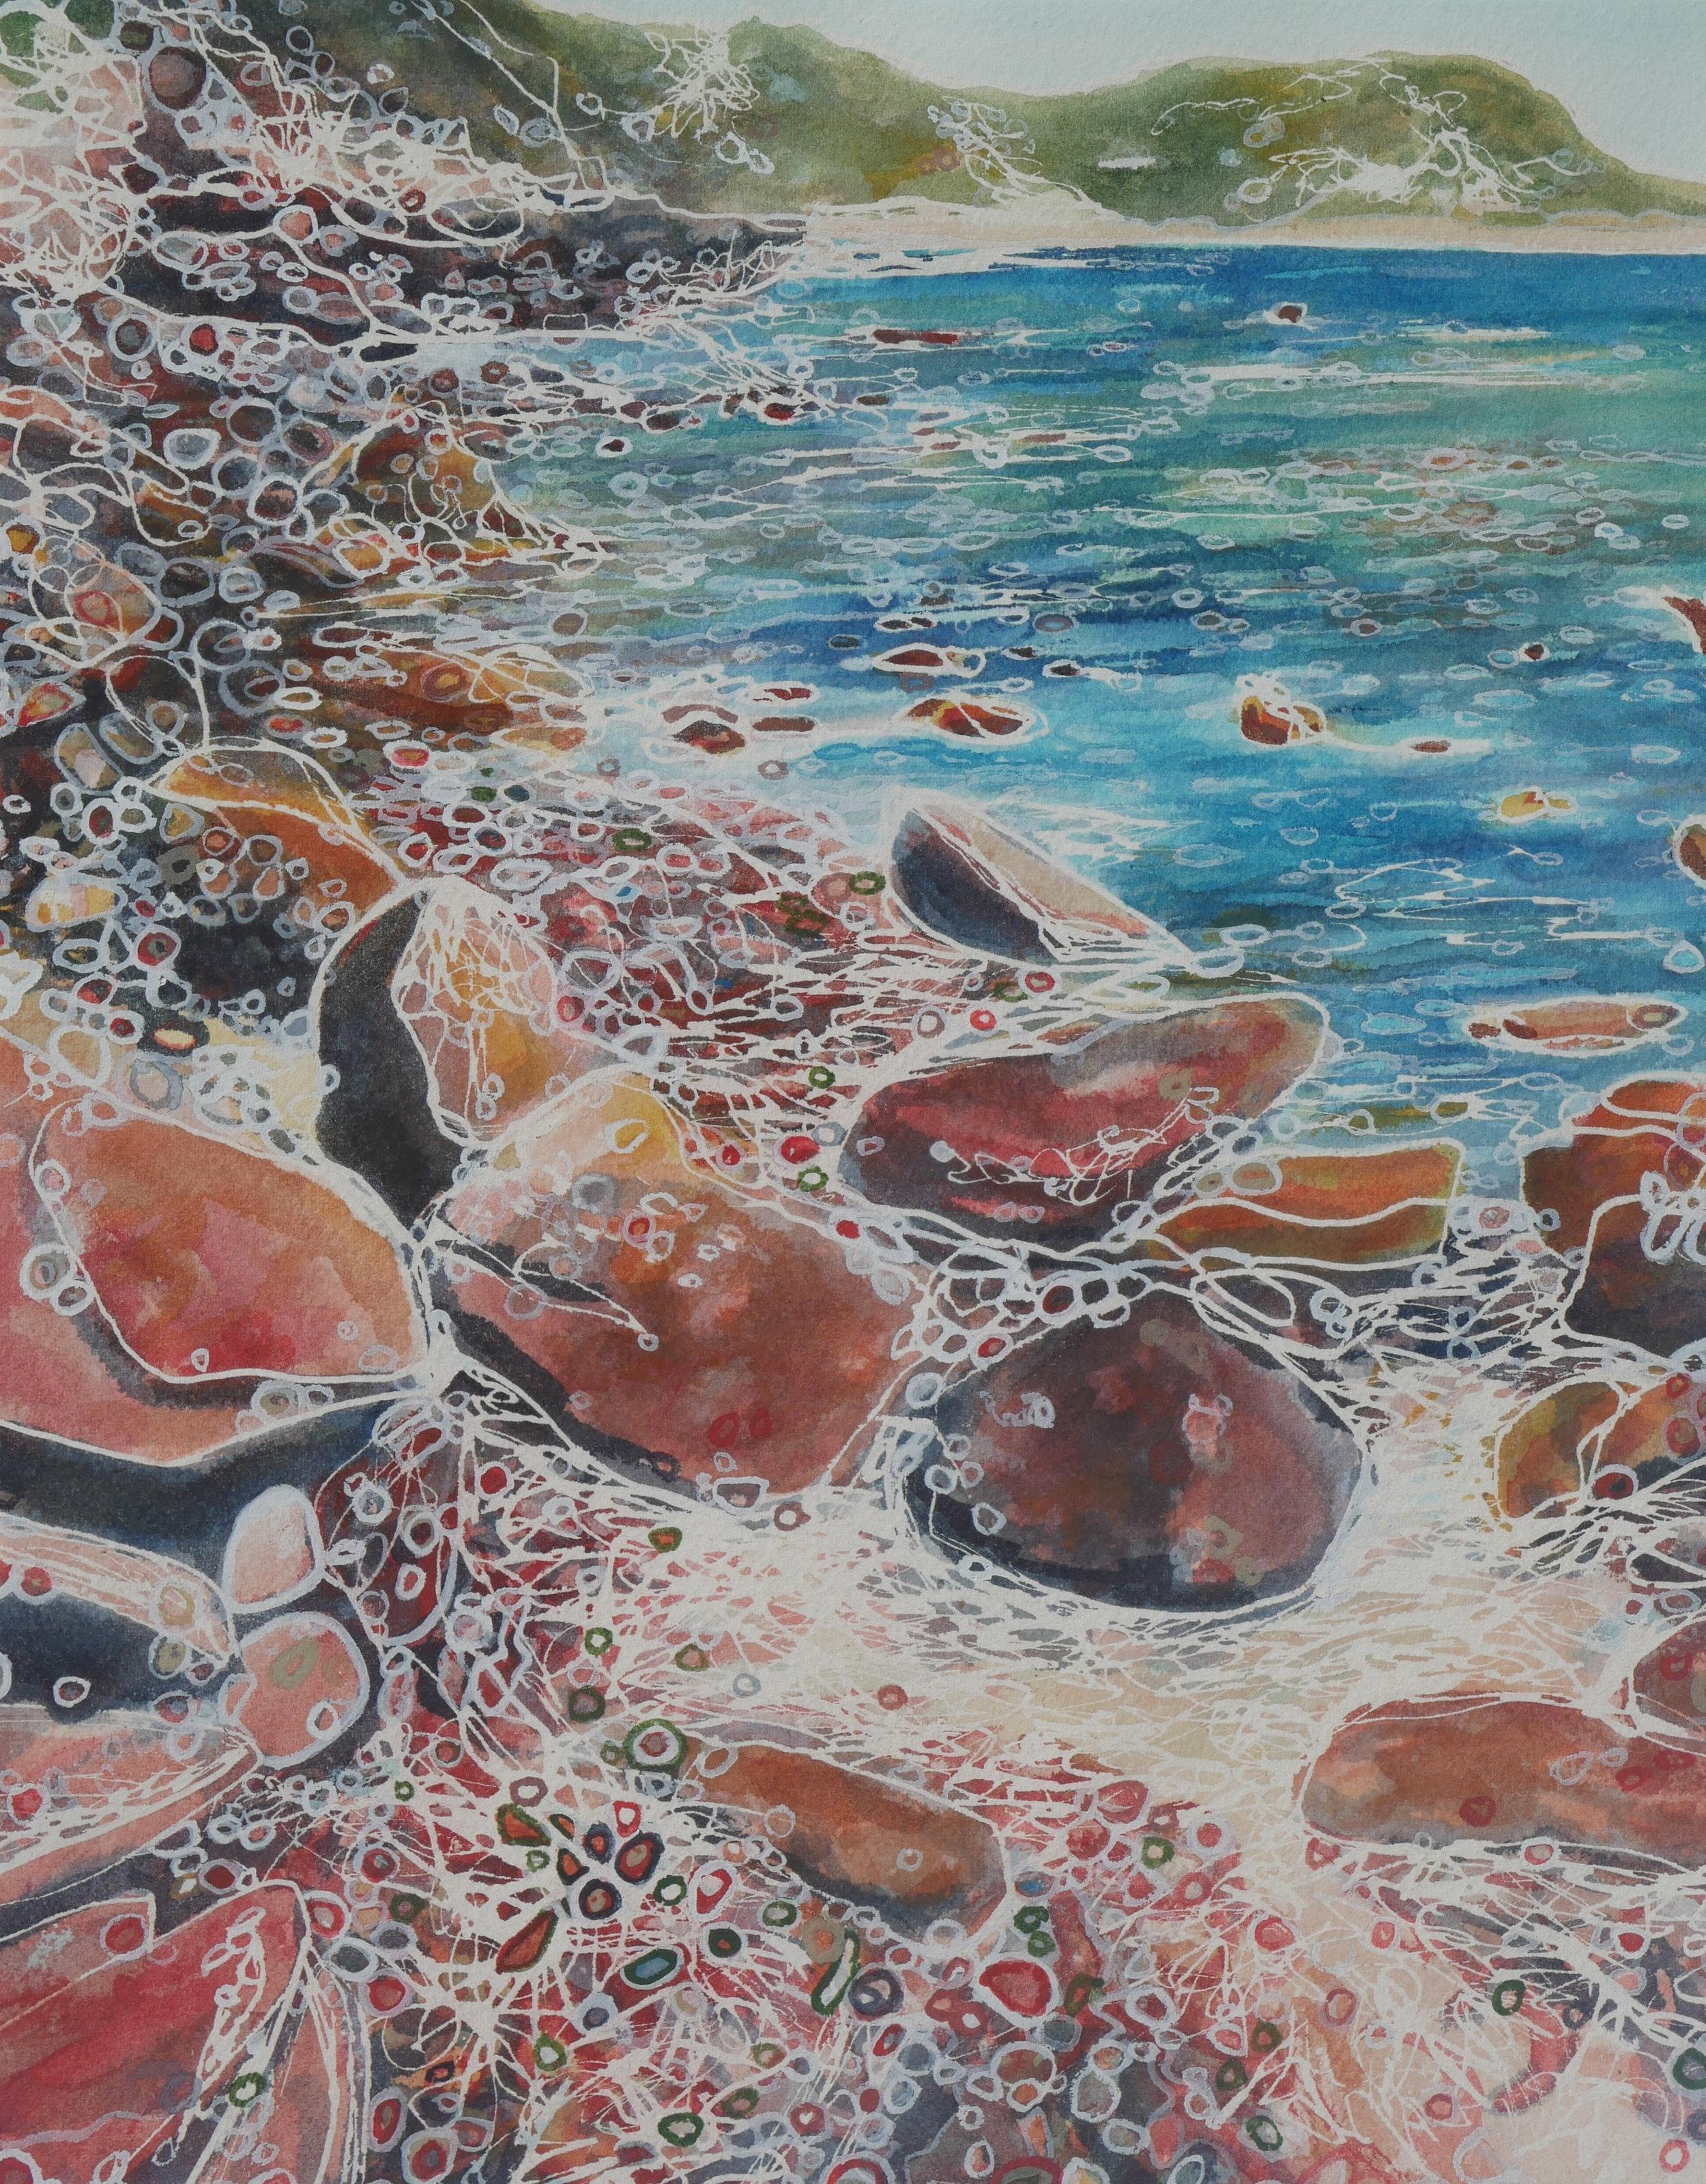 Deanne Haddow_Rockpool Walk 11_2018_Watercolour and Gouache on paper_57x47cm.jpg